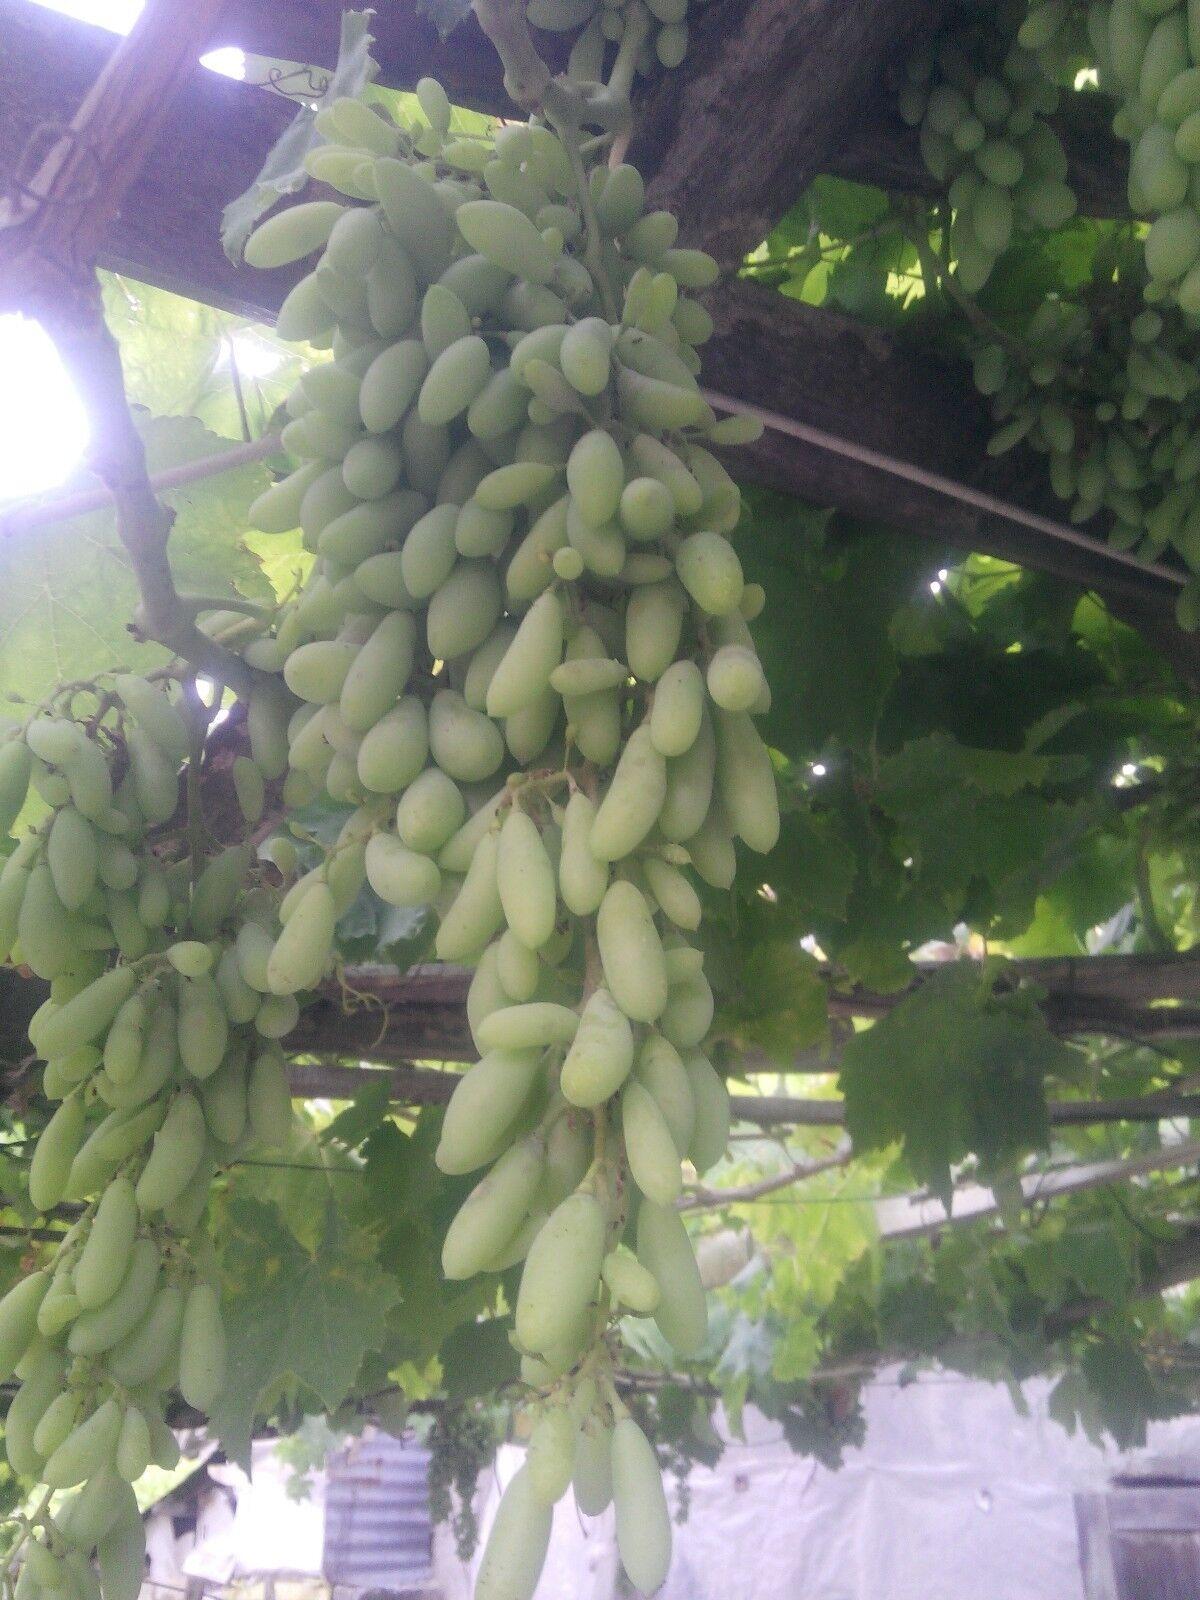 Dedo de oro verde uva (injertadas) de Turquía